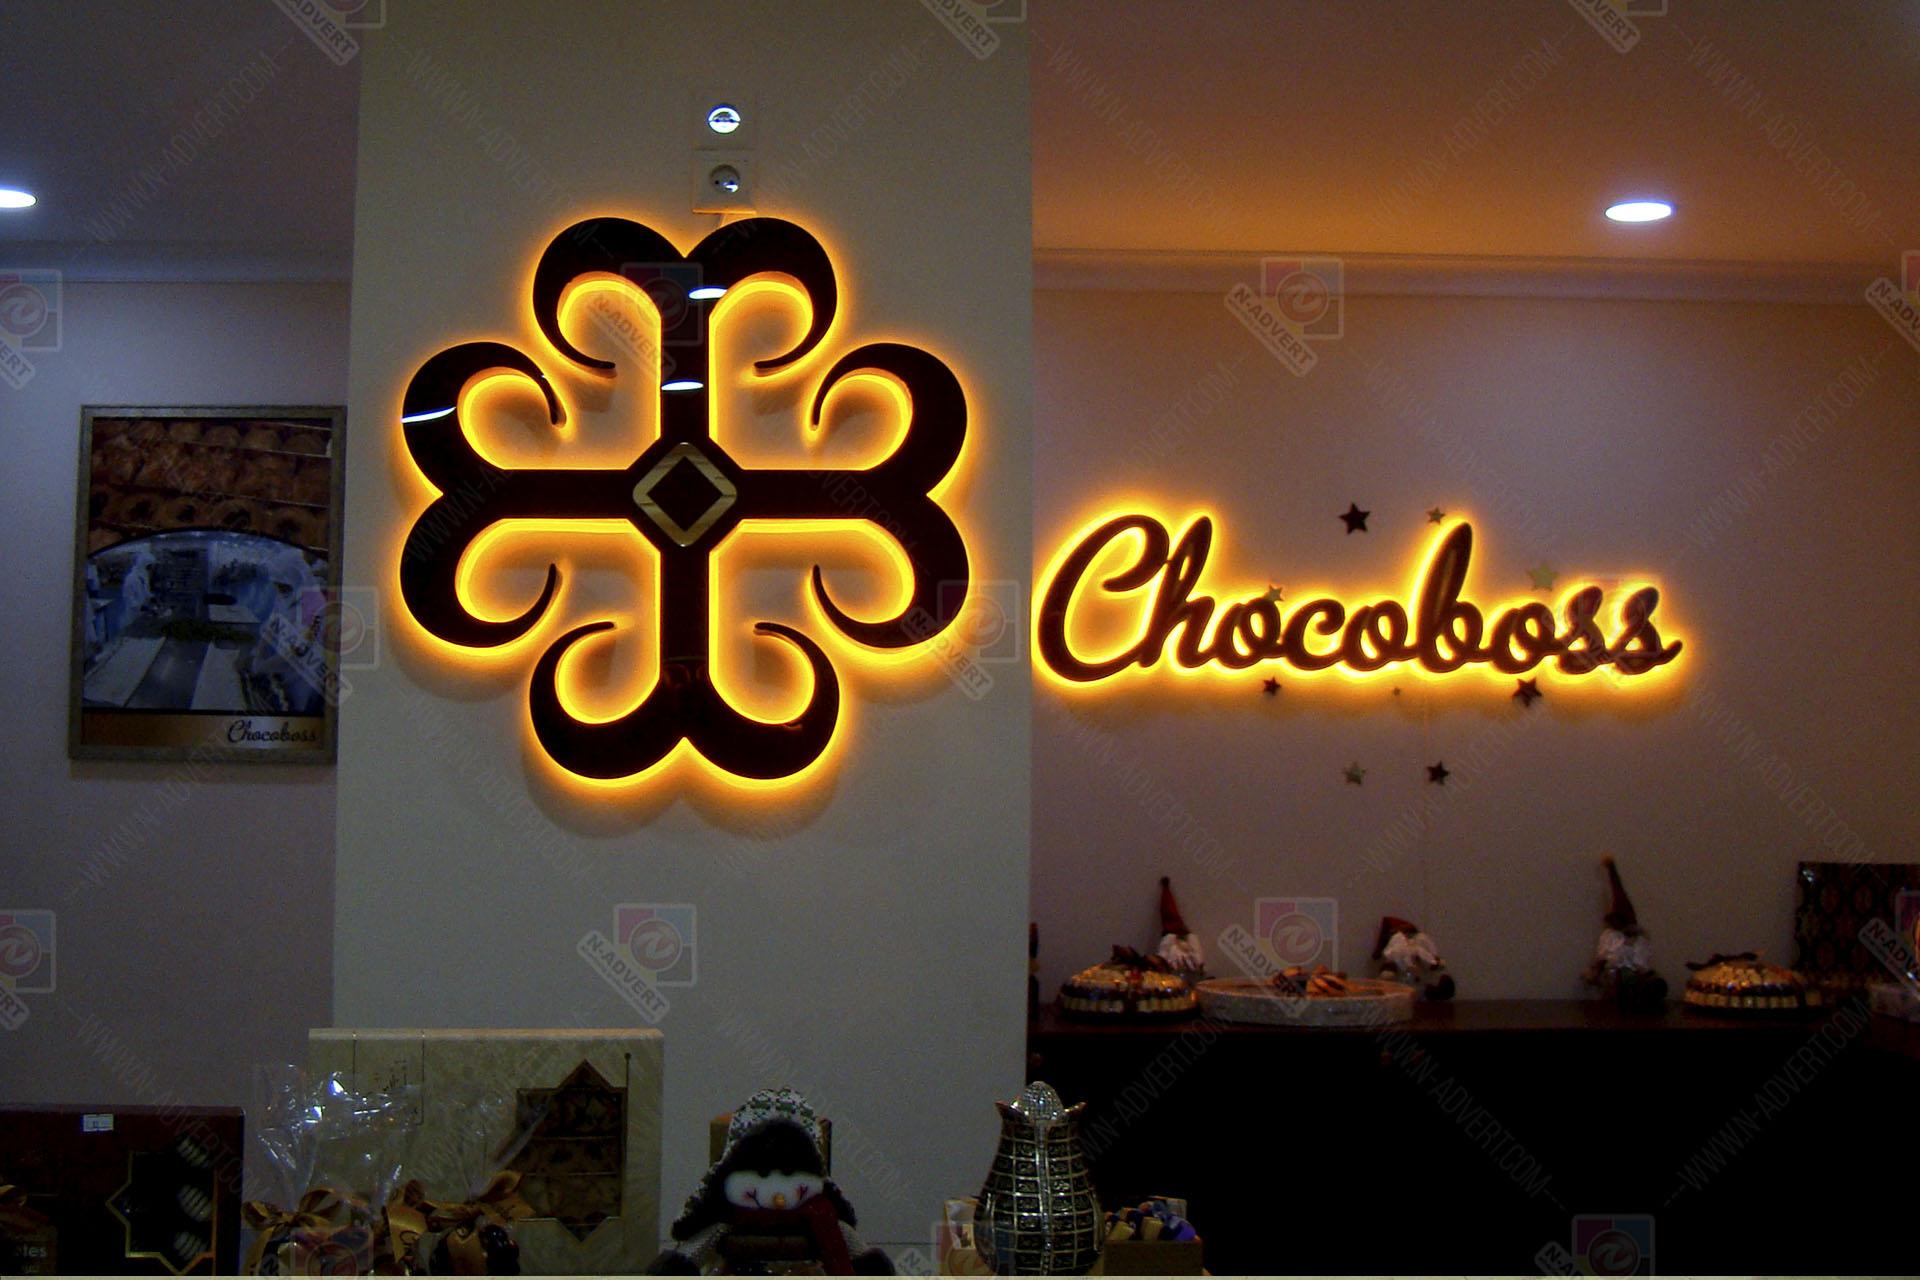 Chocobos 1920x1280